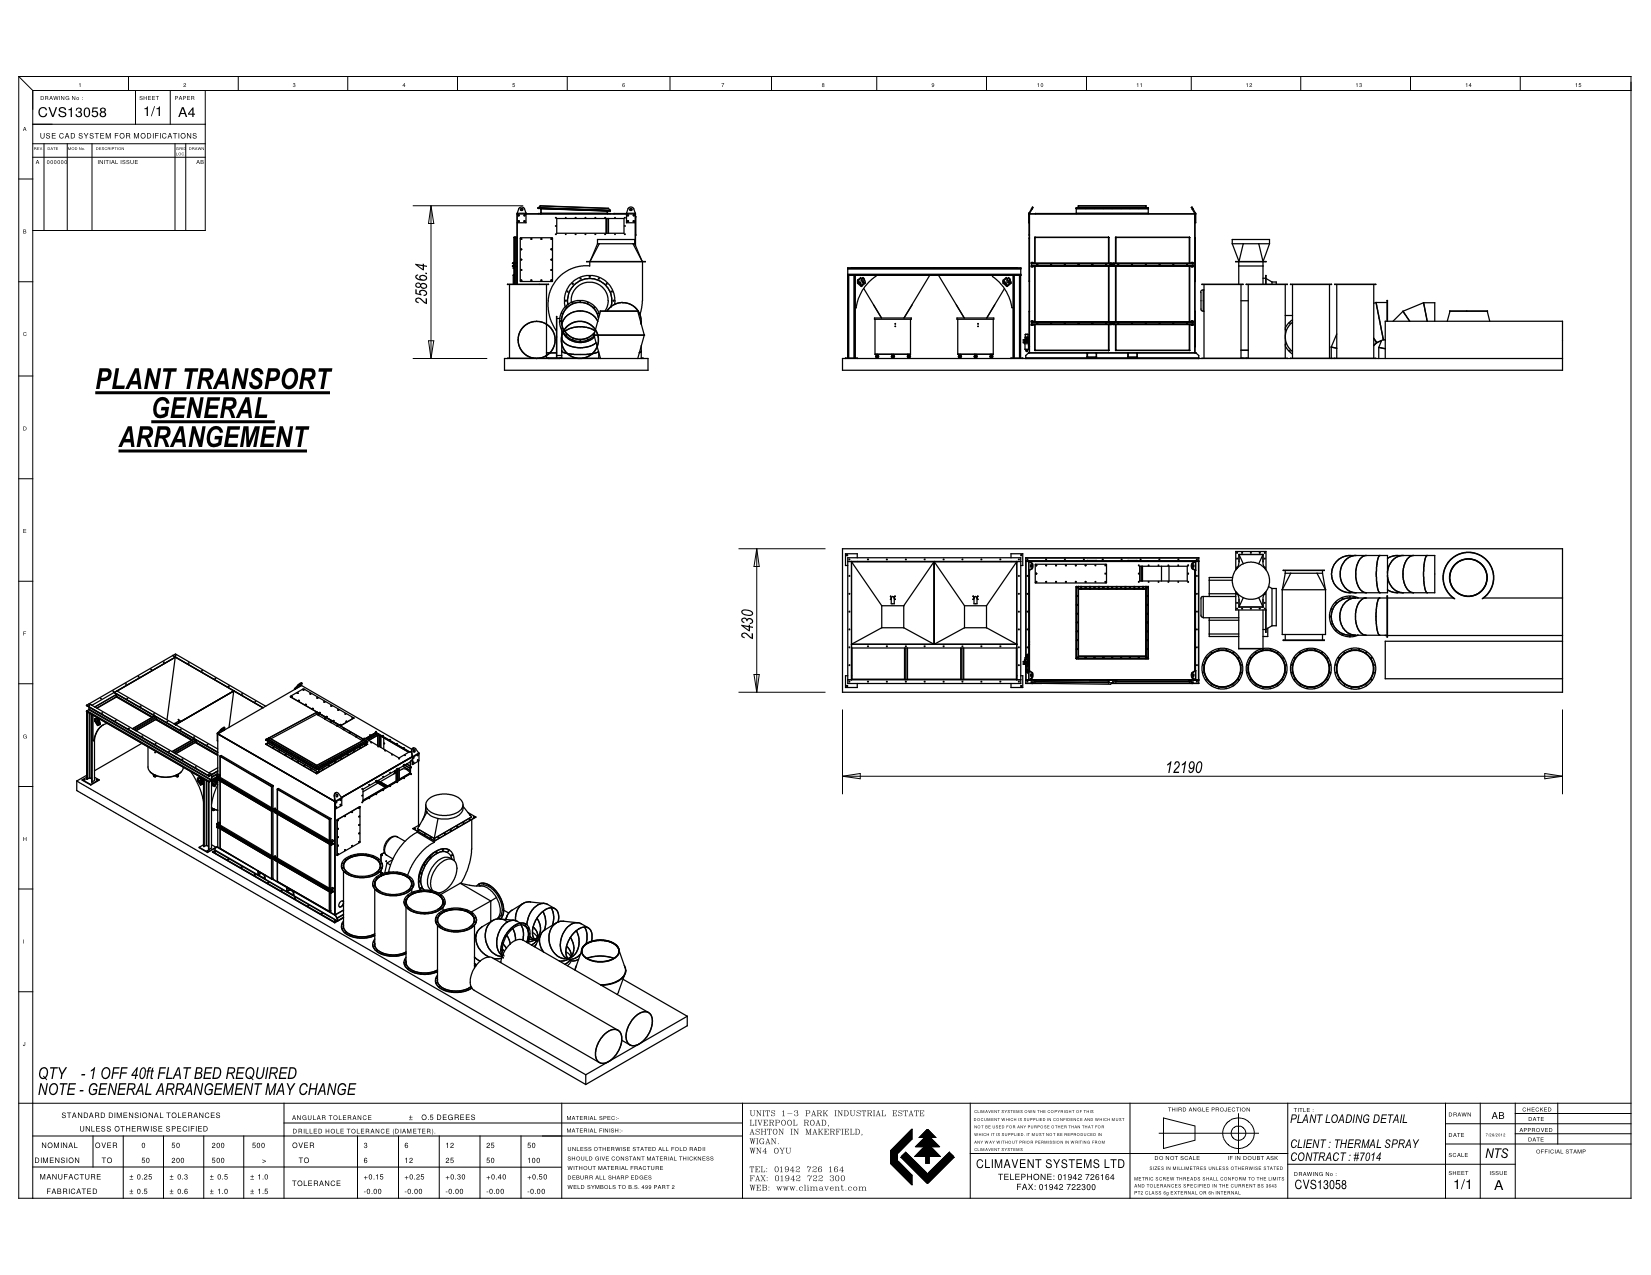 loading plan 40ft flat bed